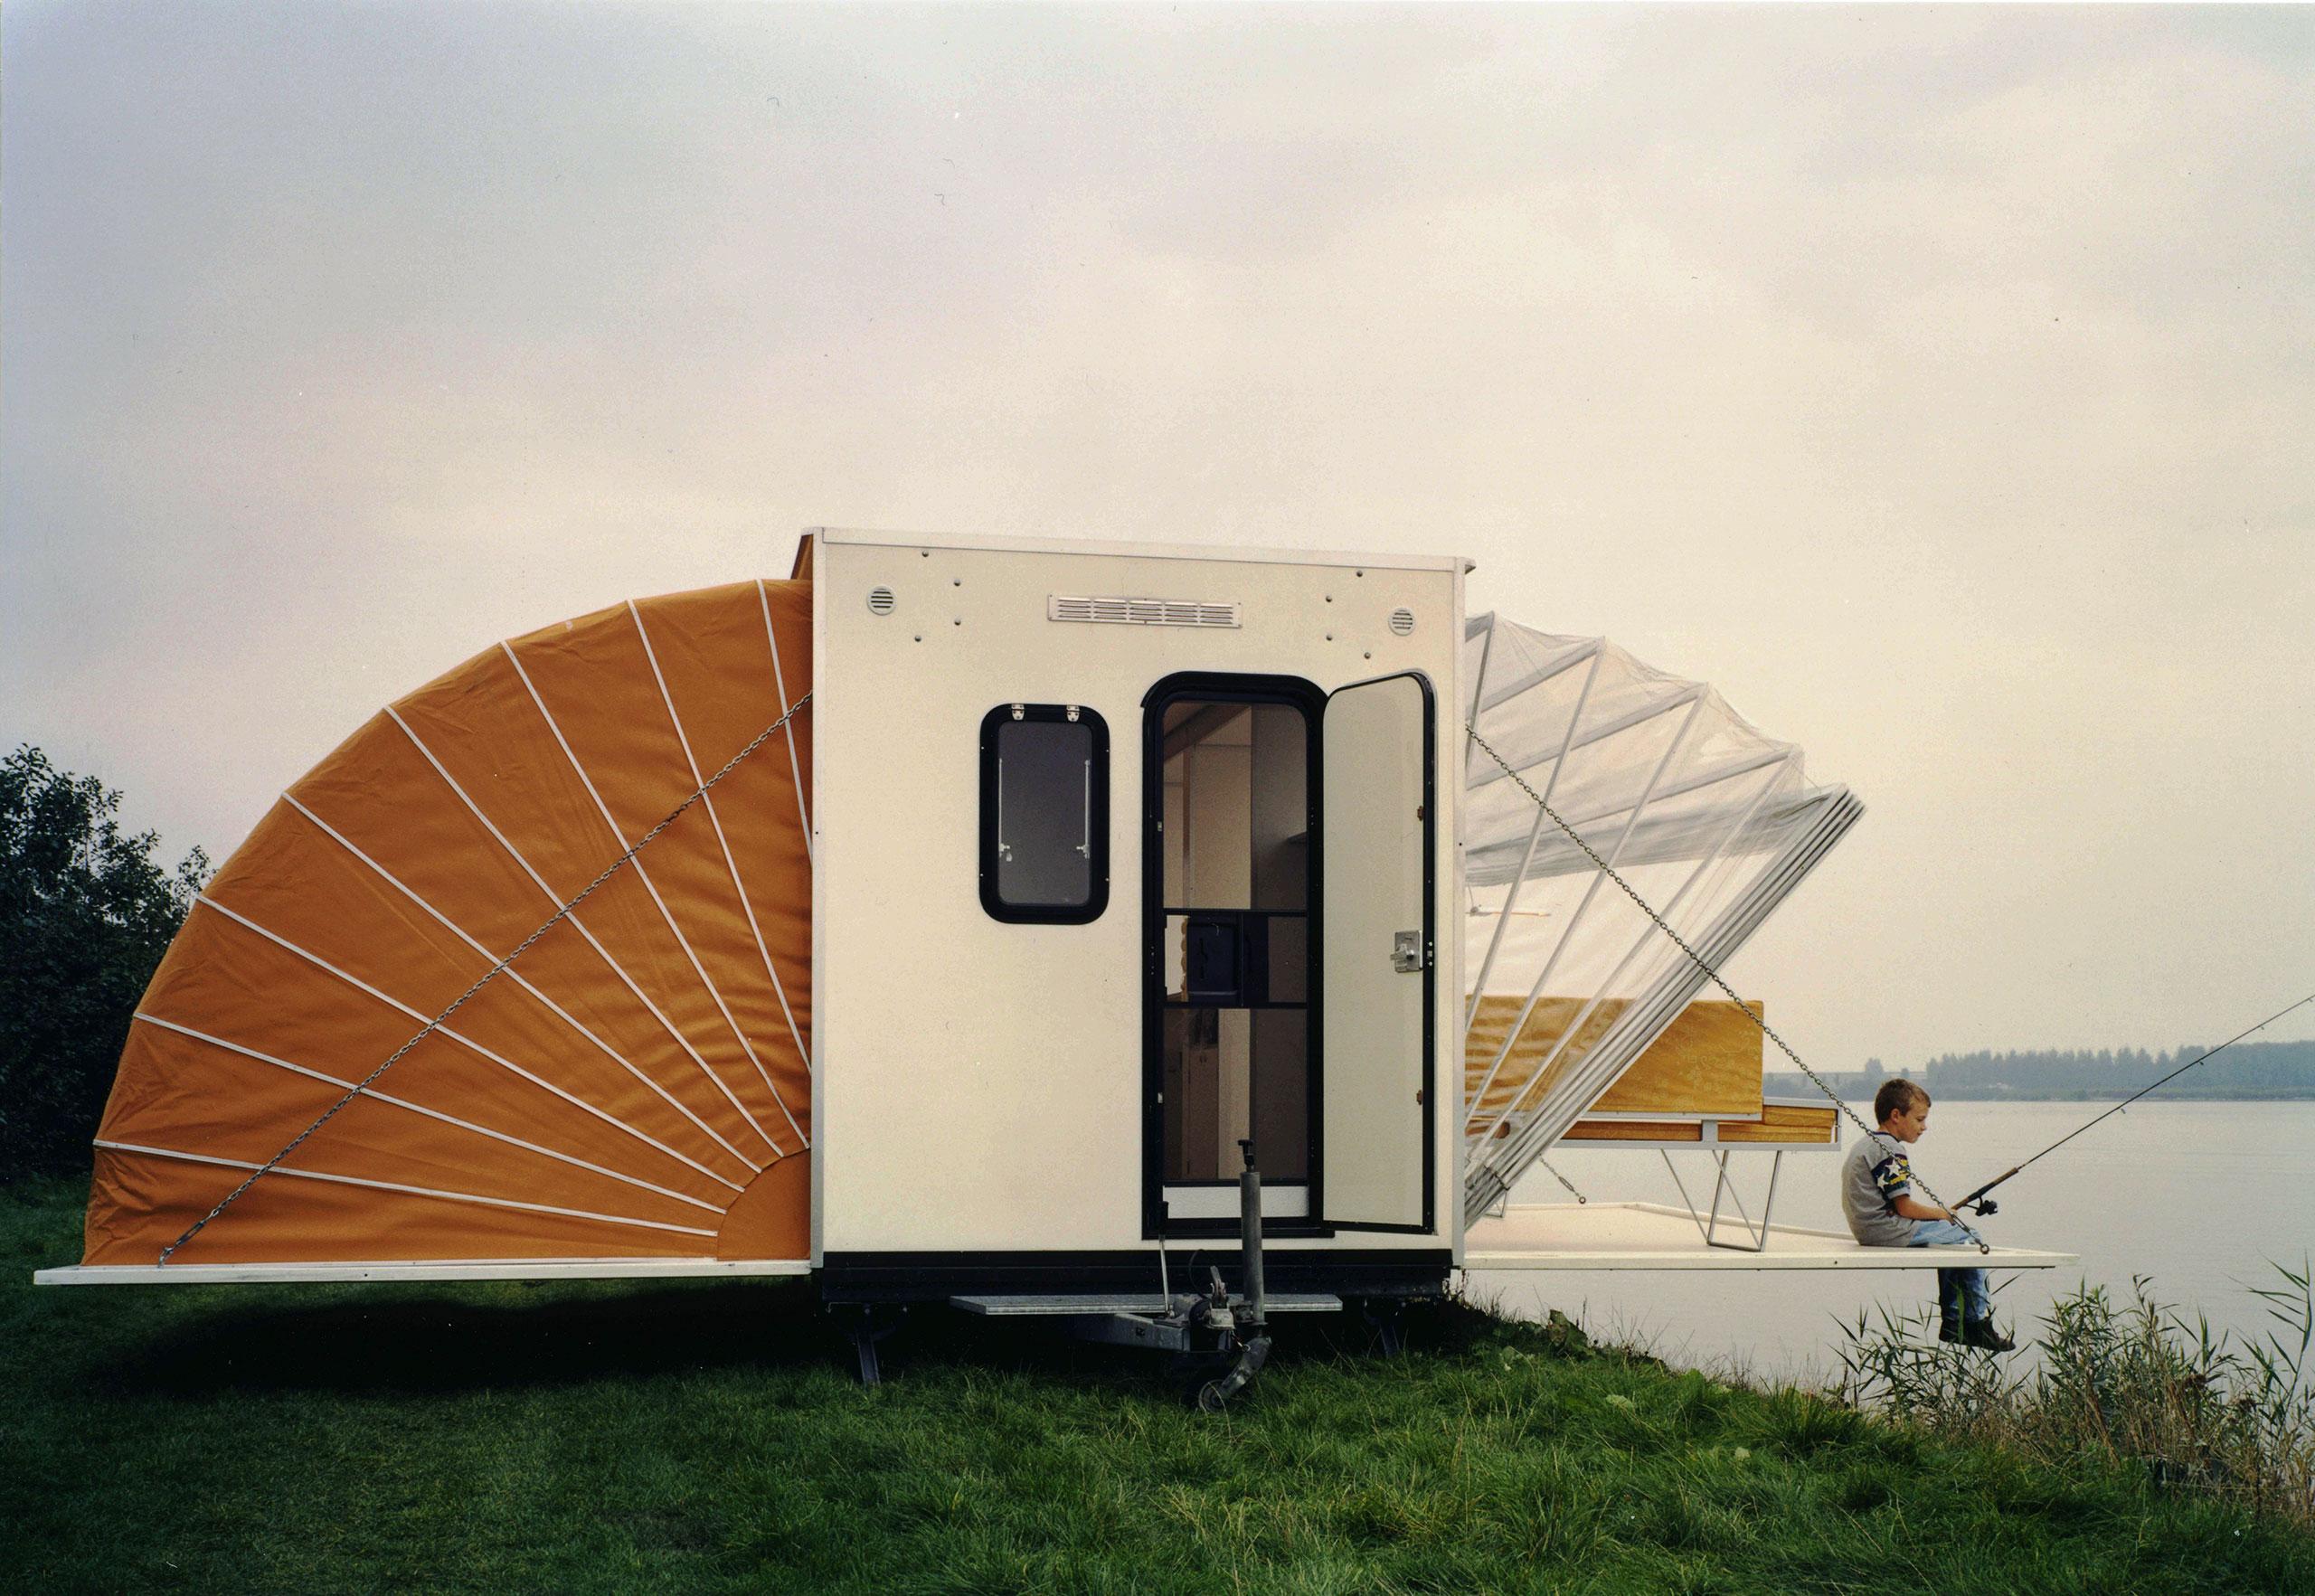 BöhtlingkArchitecture, Netherlands,photography by Roos Aldershoff, fromOff the Road, © Gestalten 2016.